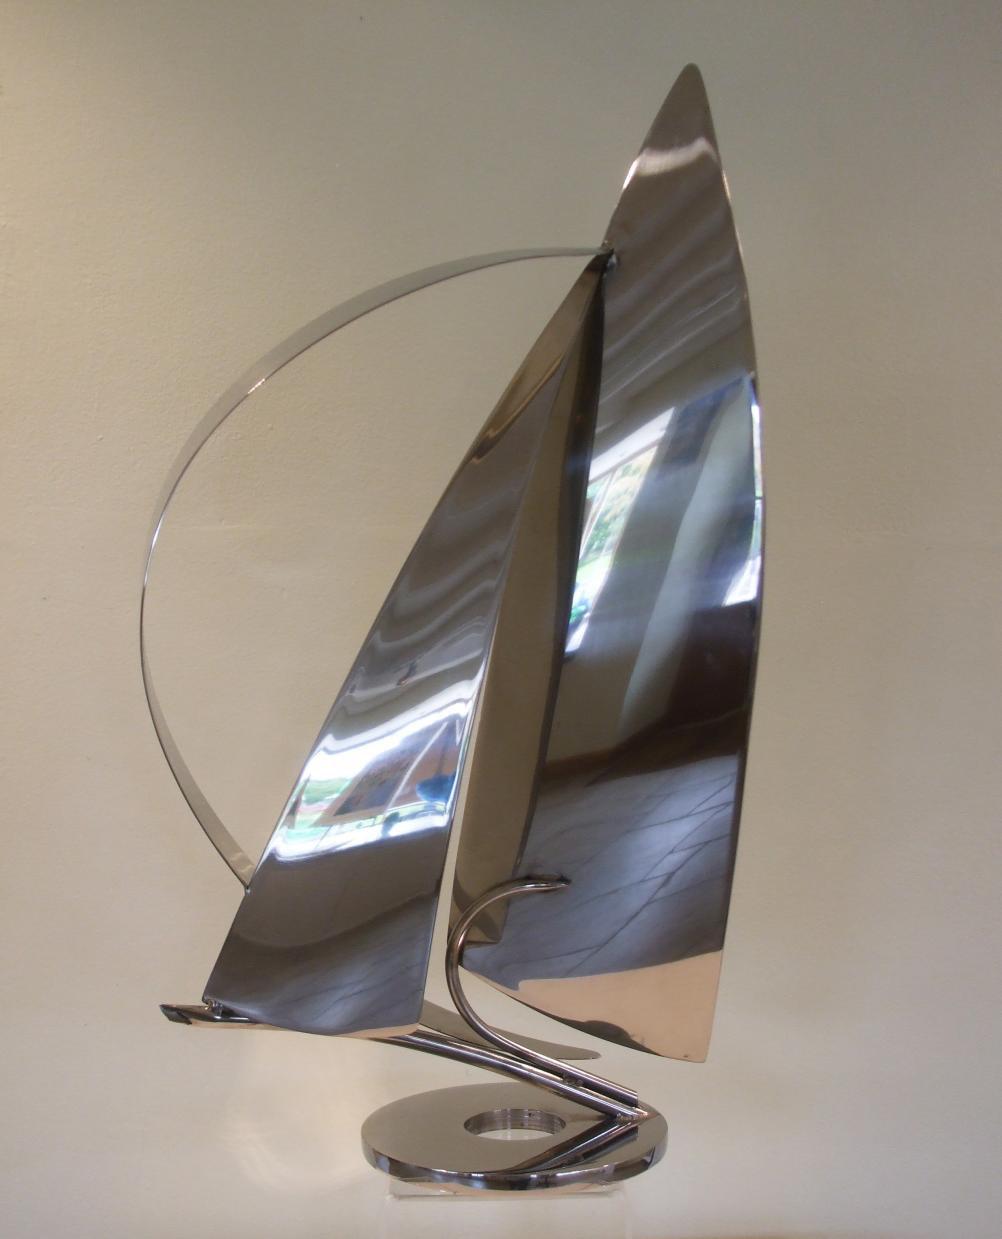 Medium Deco yacht on a circular base